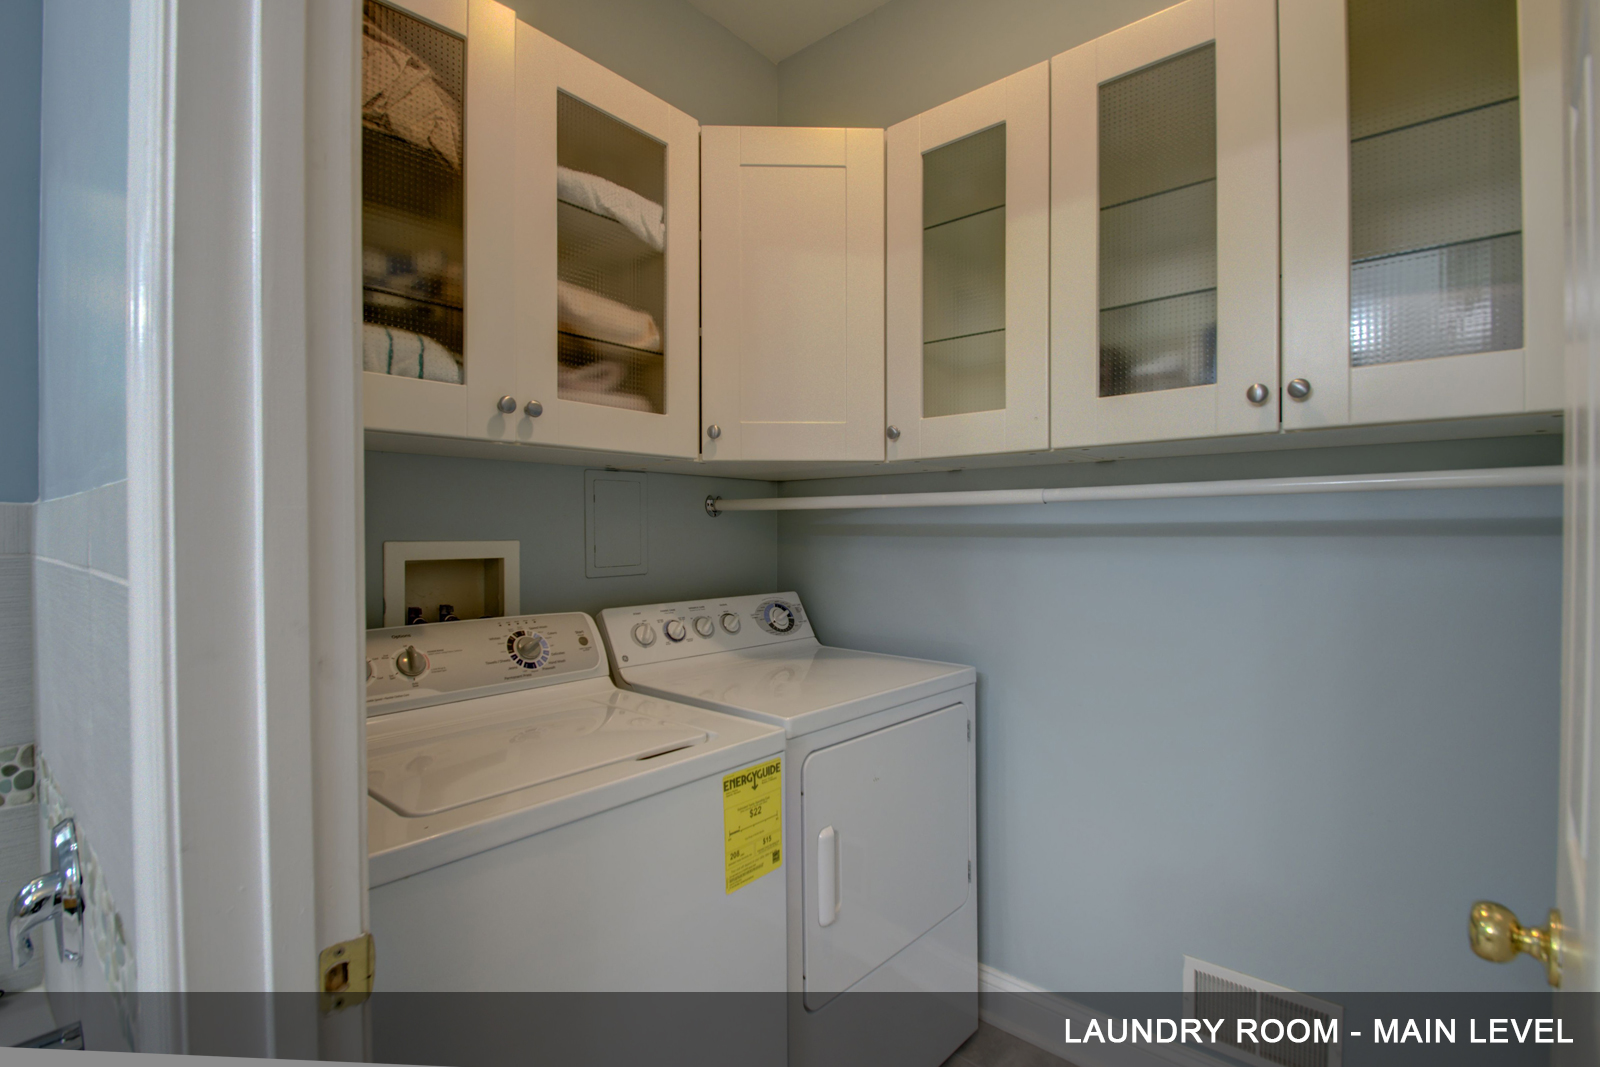 13-Laundry-Room.jpg